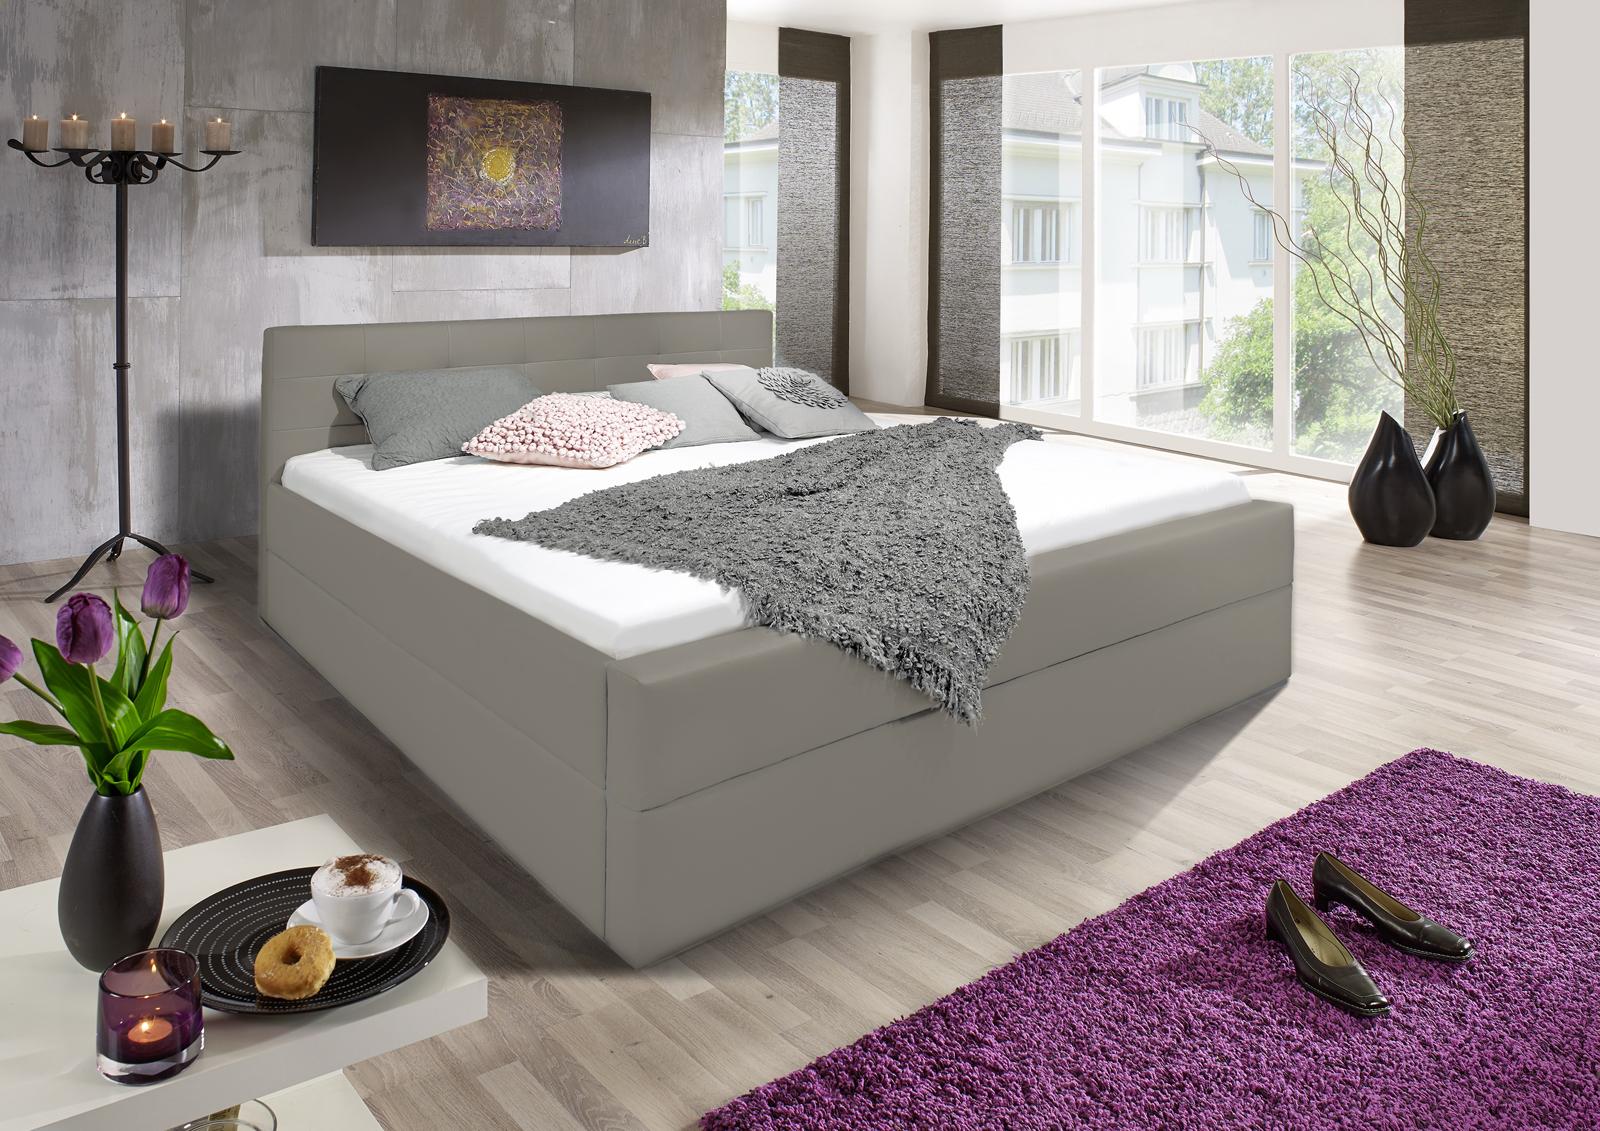 sam design boxspringbett 140 x 200 cm muddy kappa auf lager. Black Bedroom Furniture Sets. Home Design Ideas